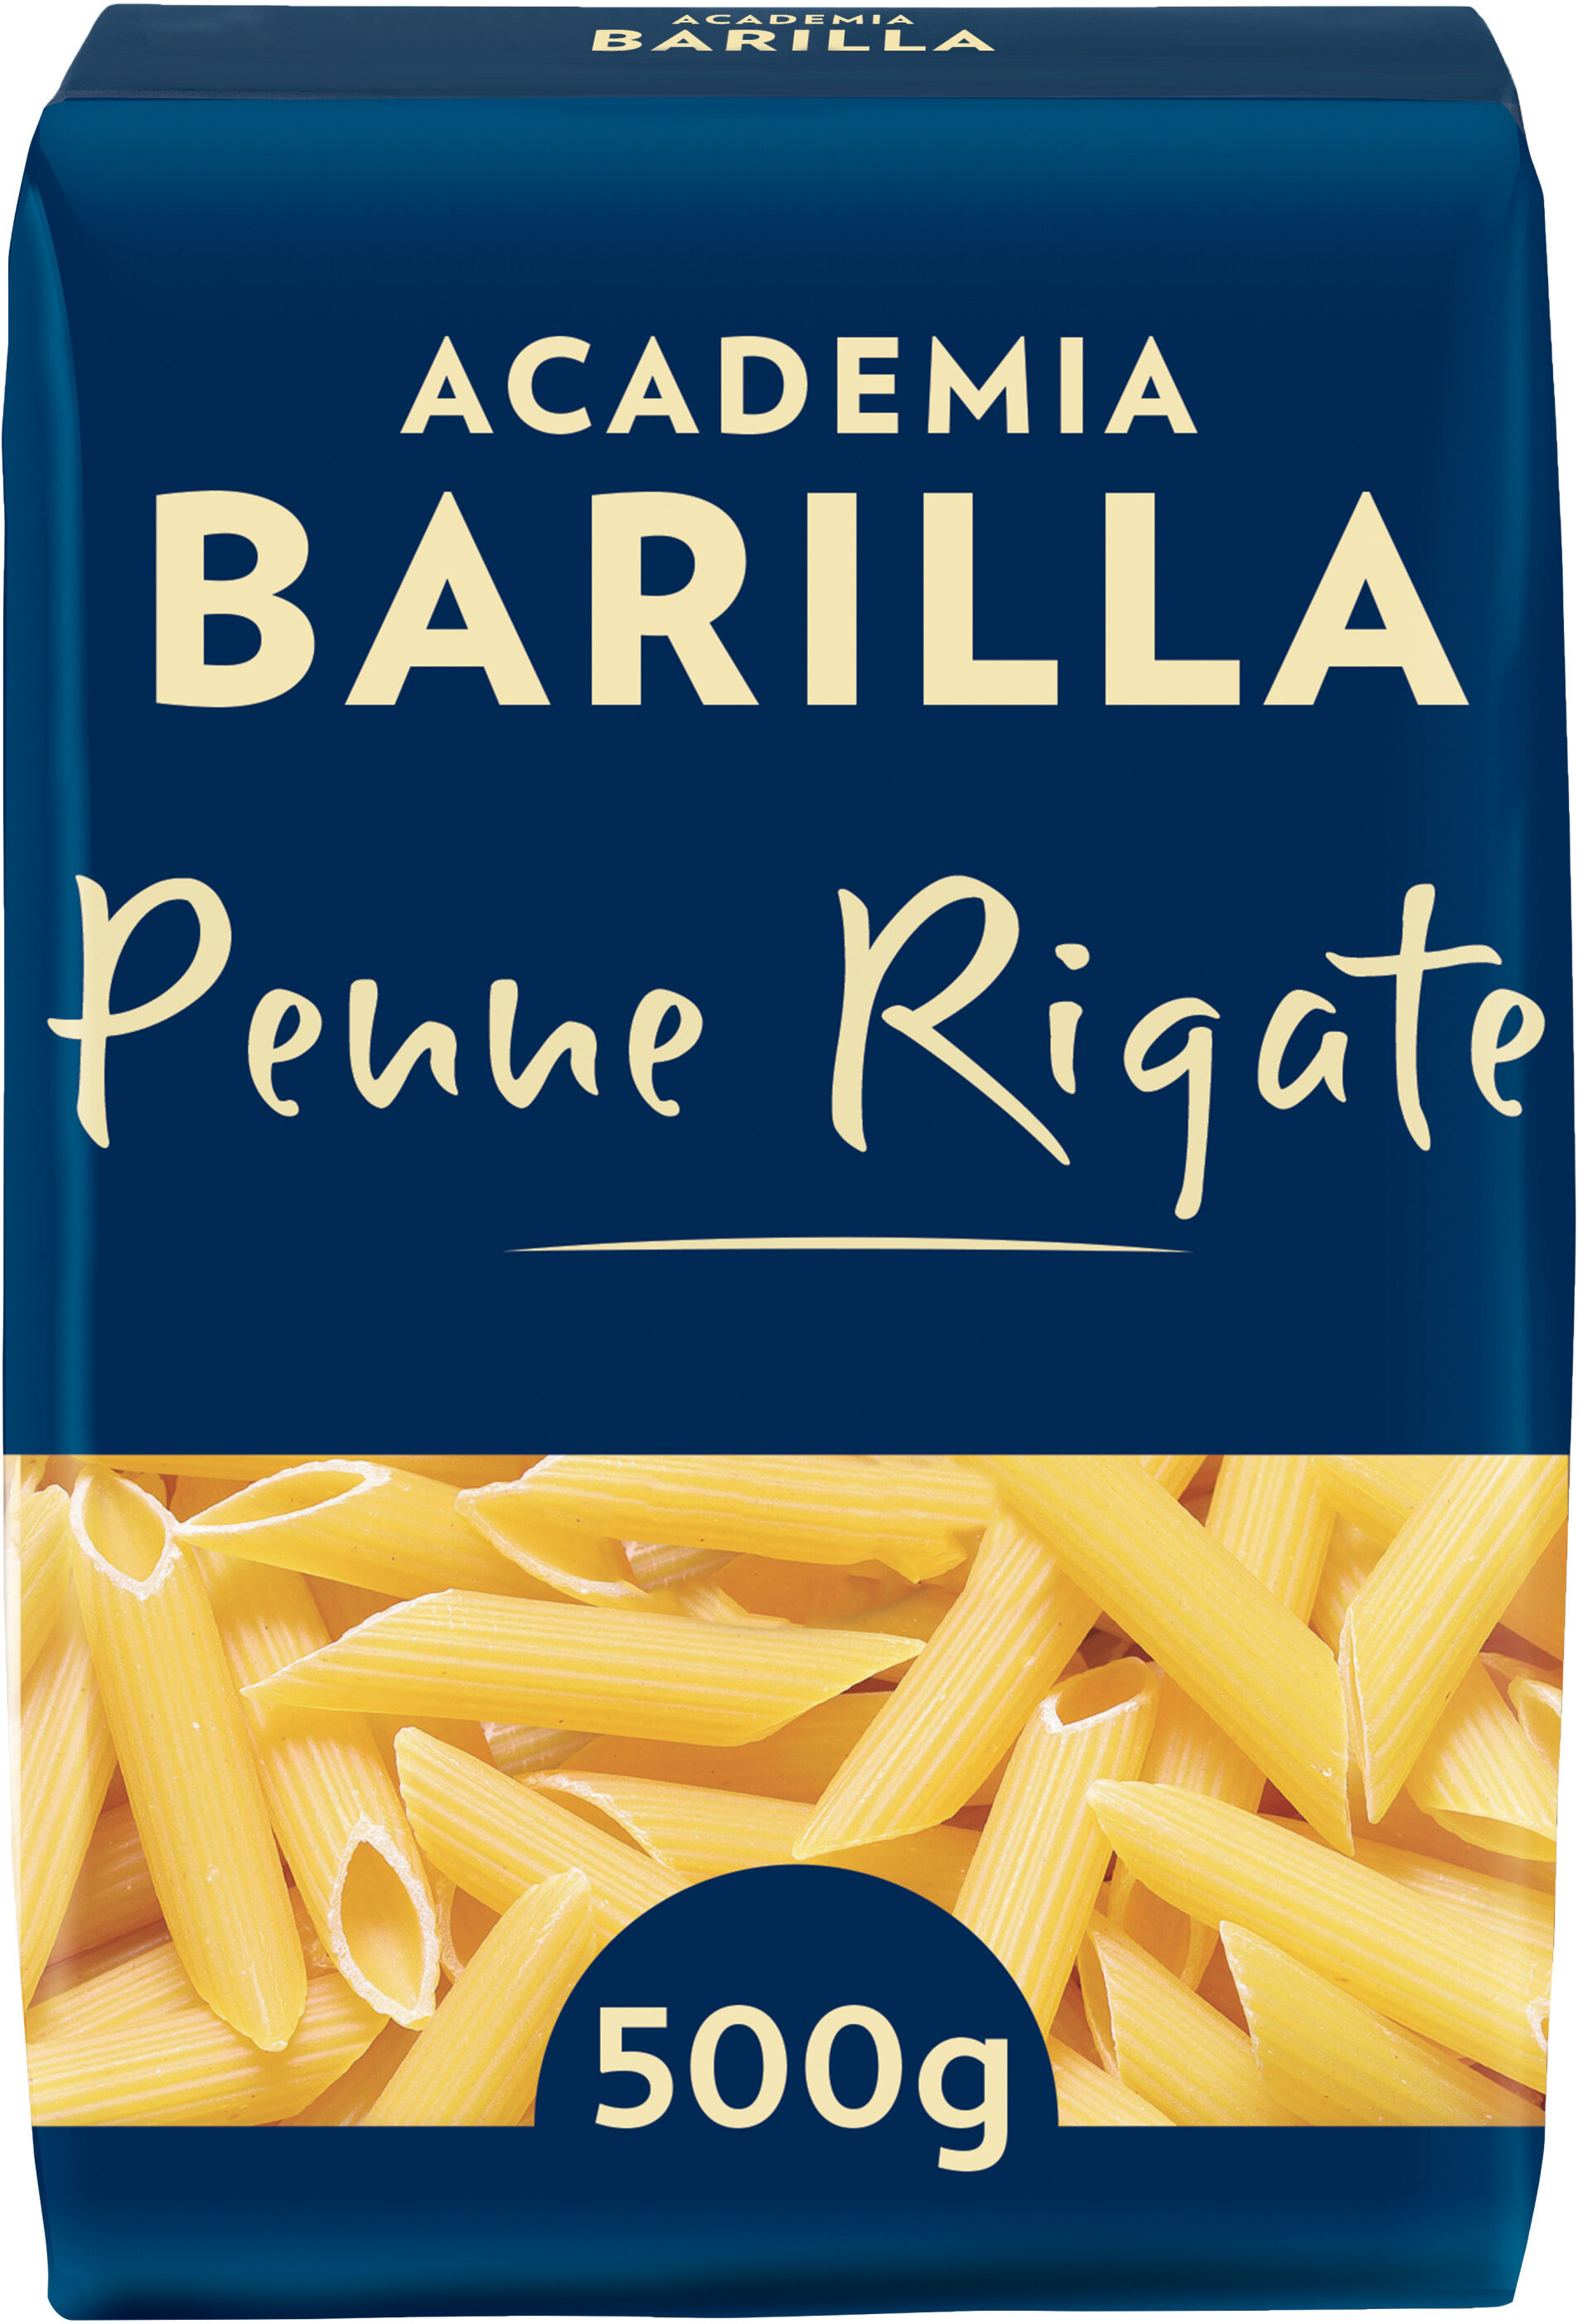 Durum Wheat Semolina Pasta Academia Barilla 500 G